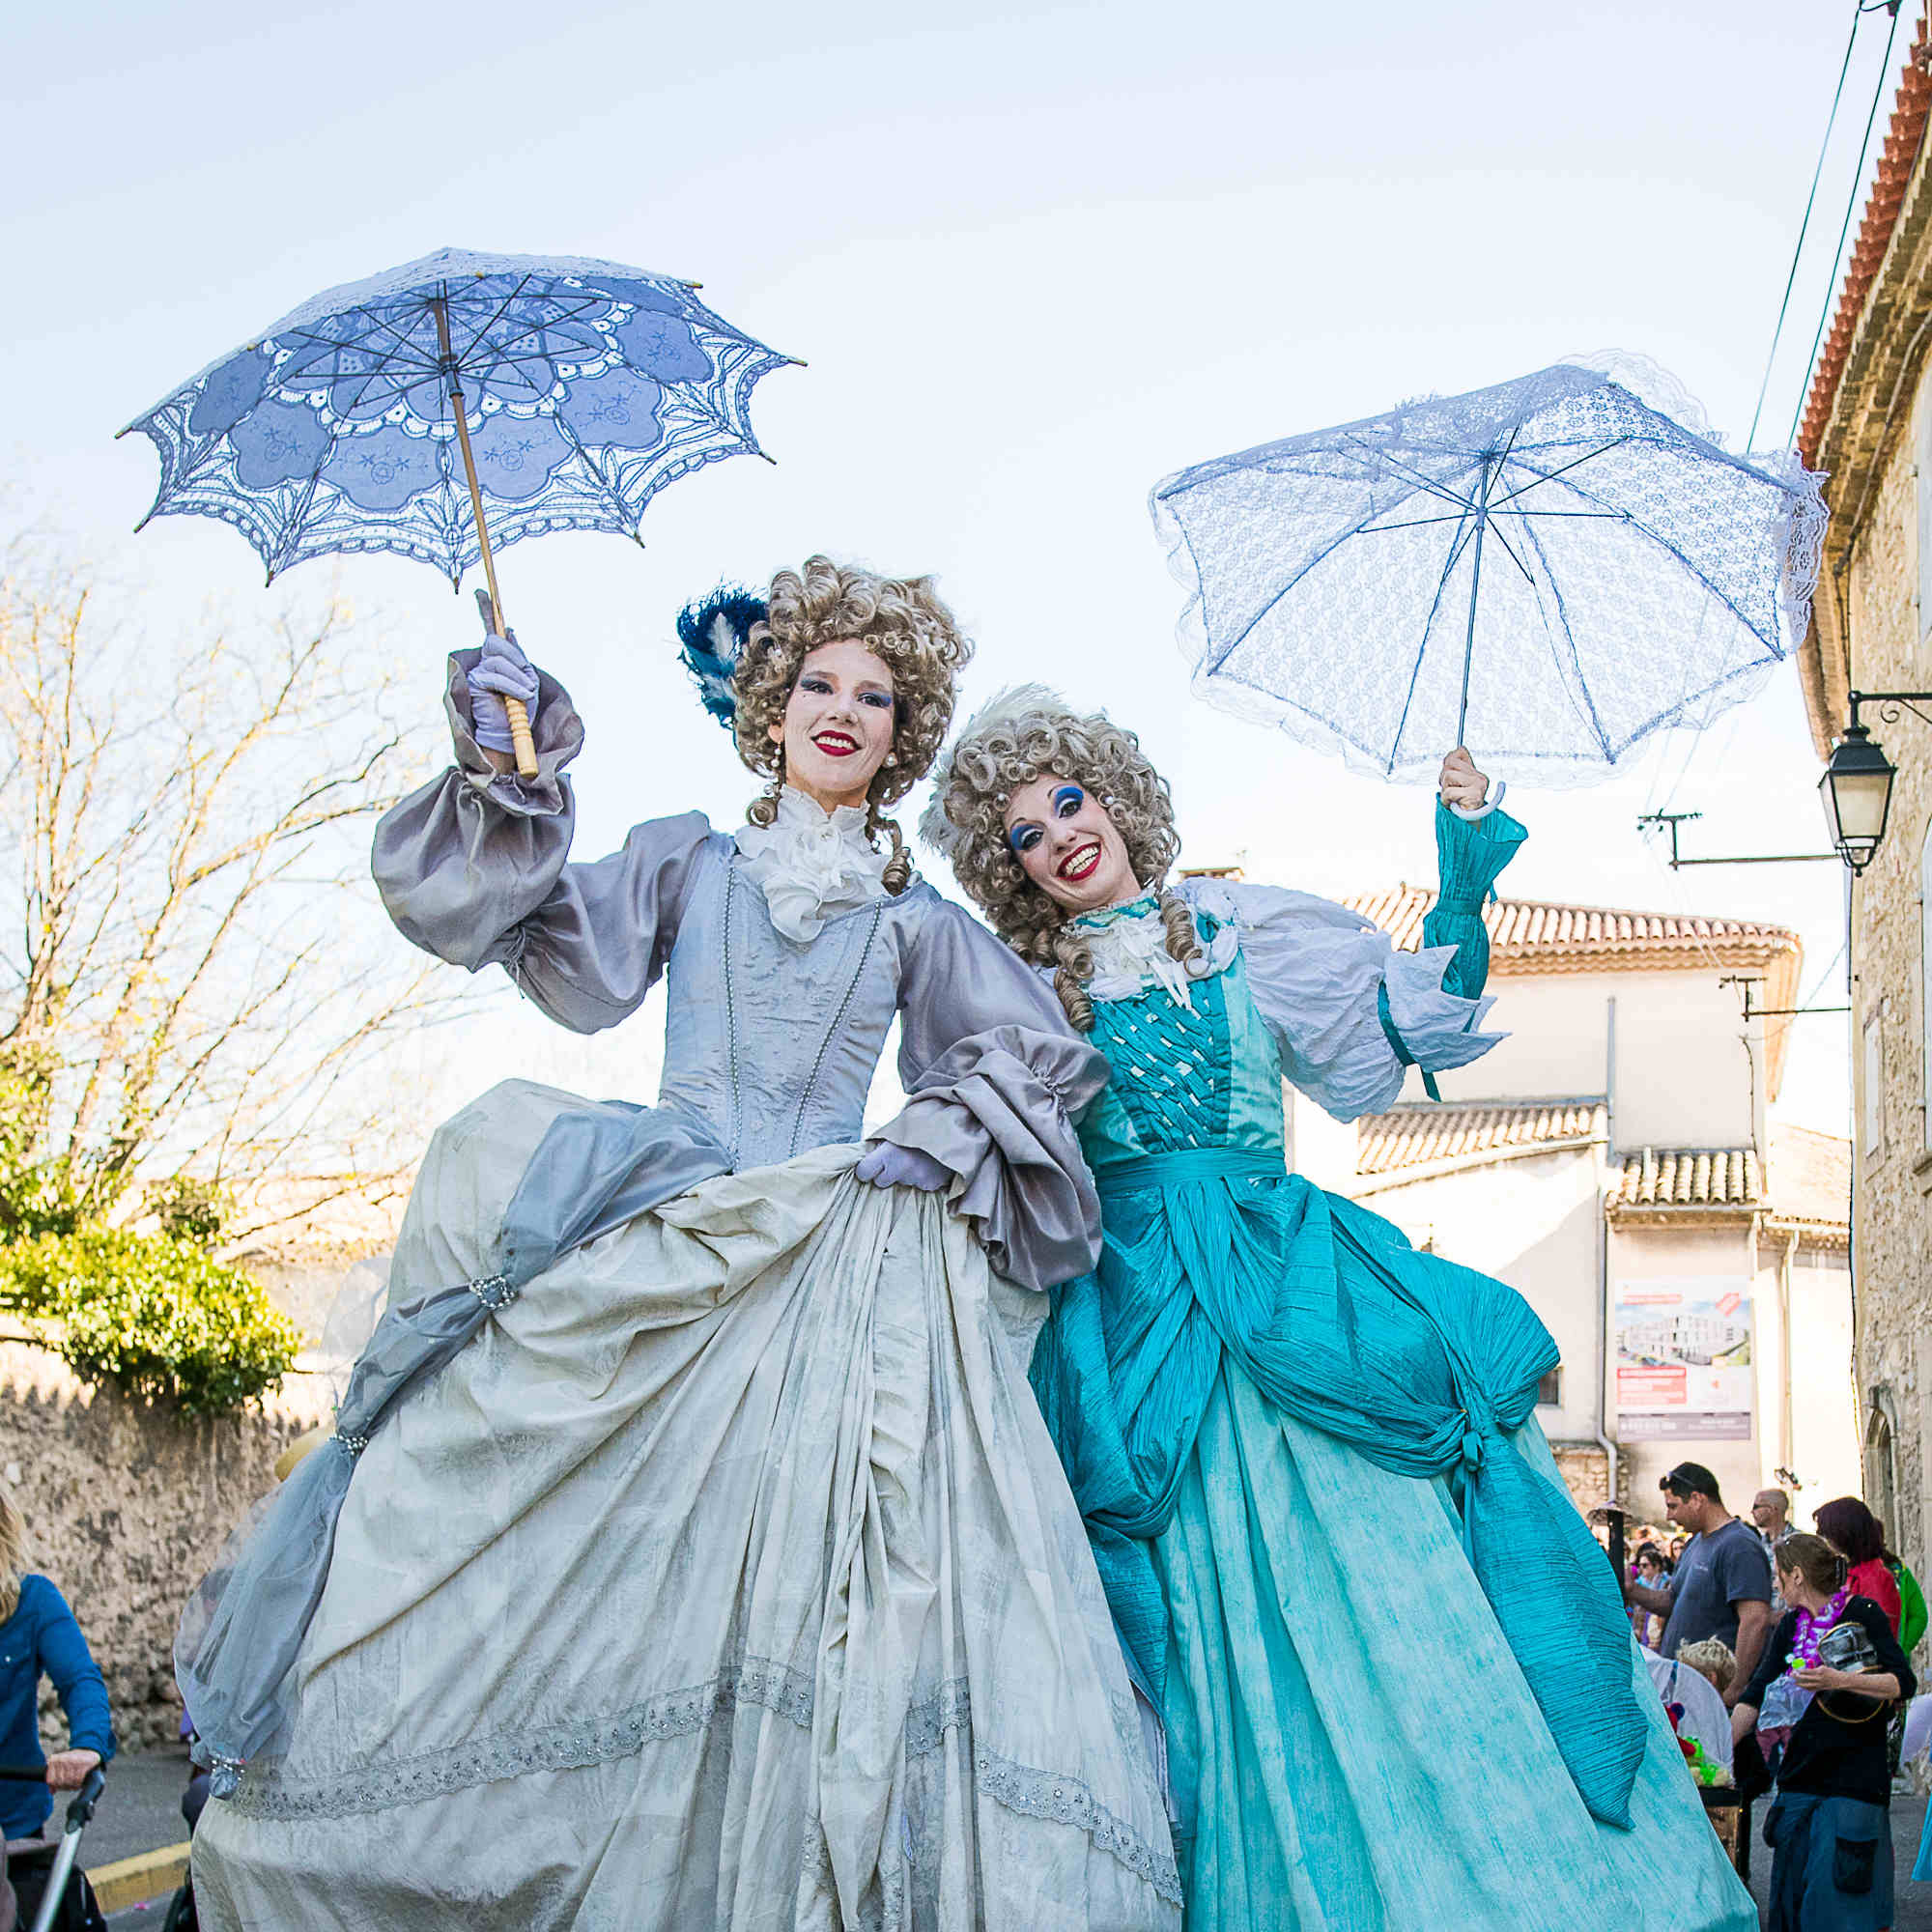 marquises-baroques-sur-echasses-parade-carnaval-cirque-indigo